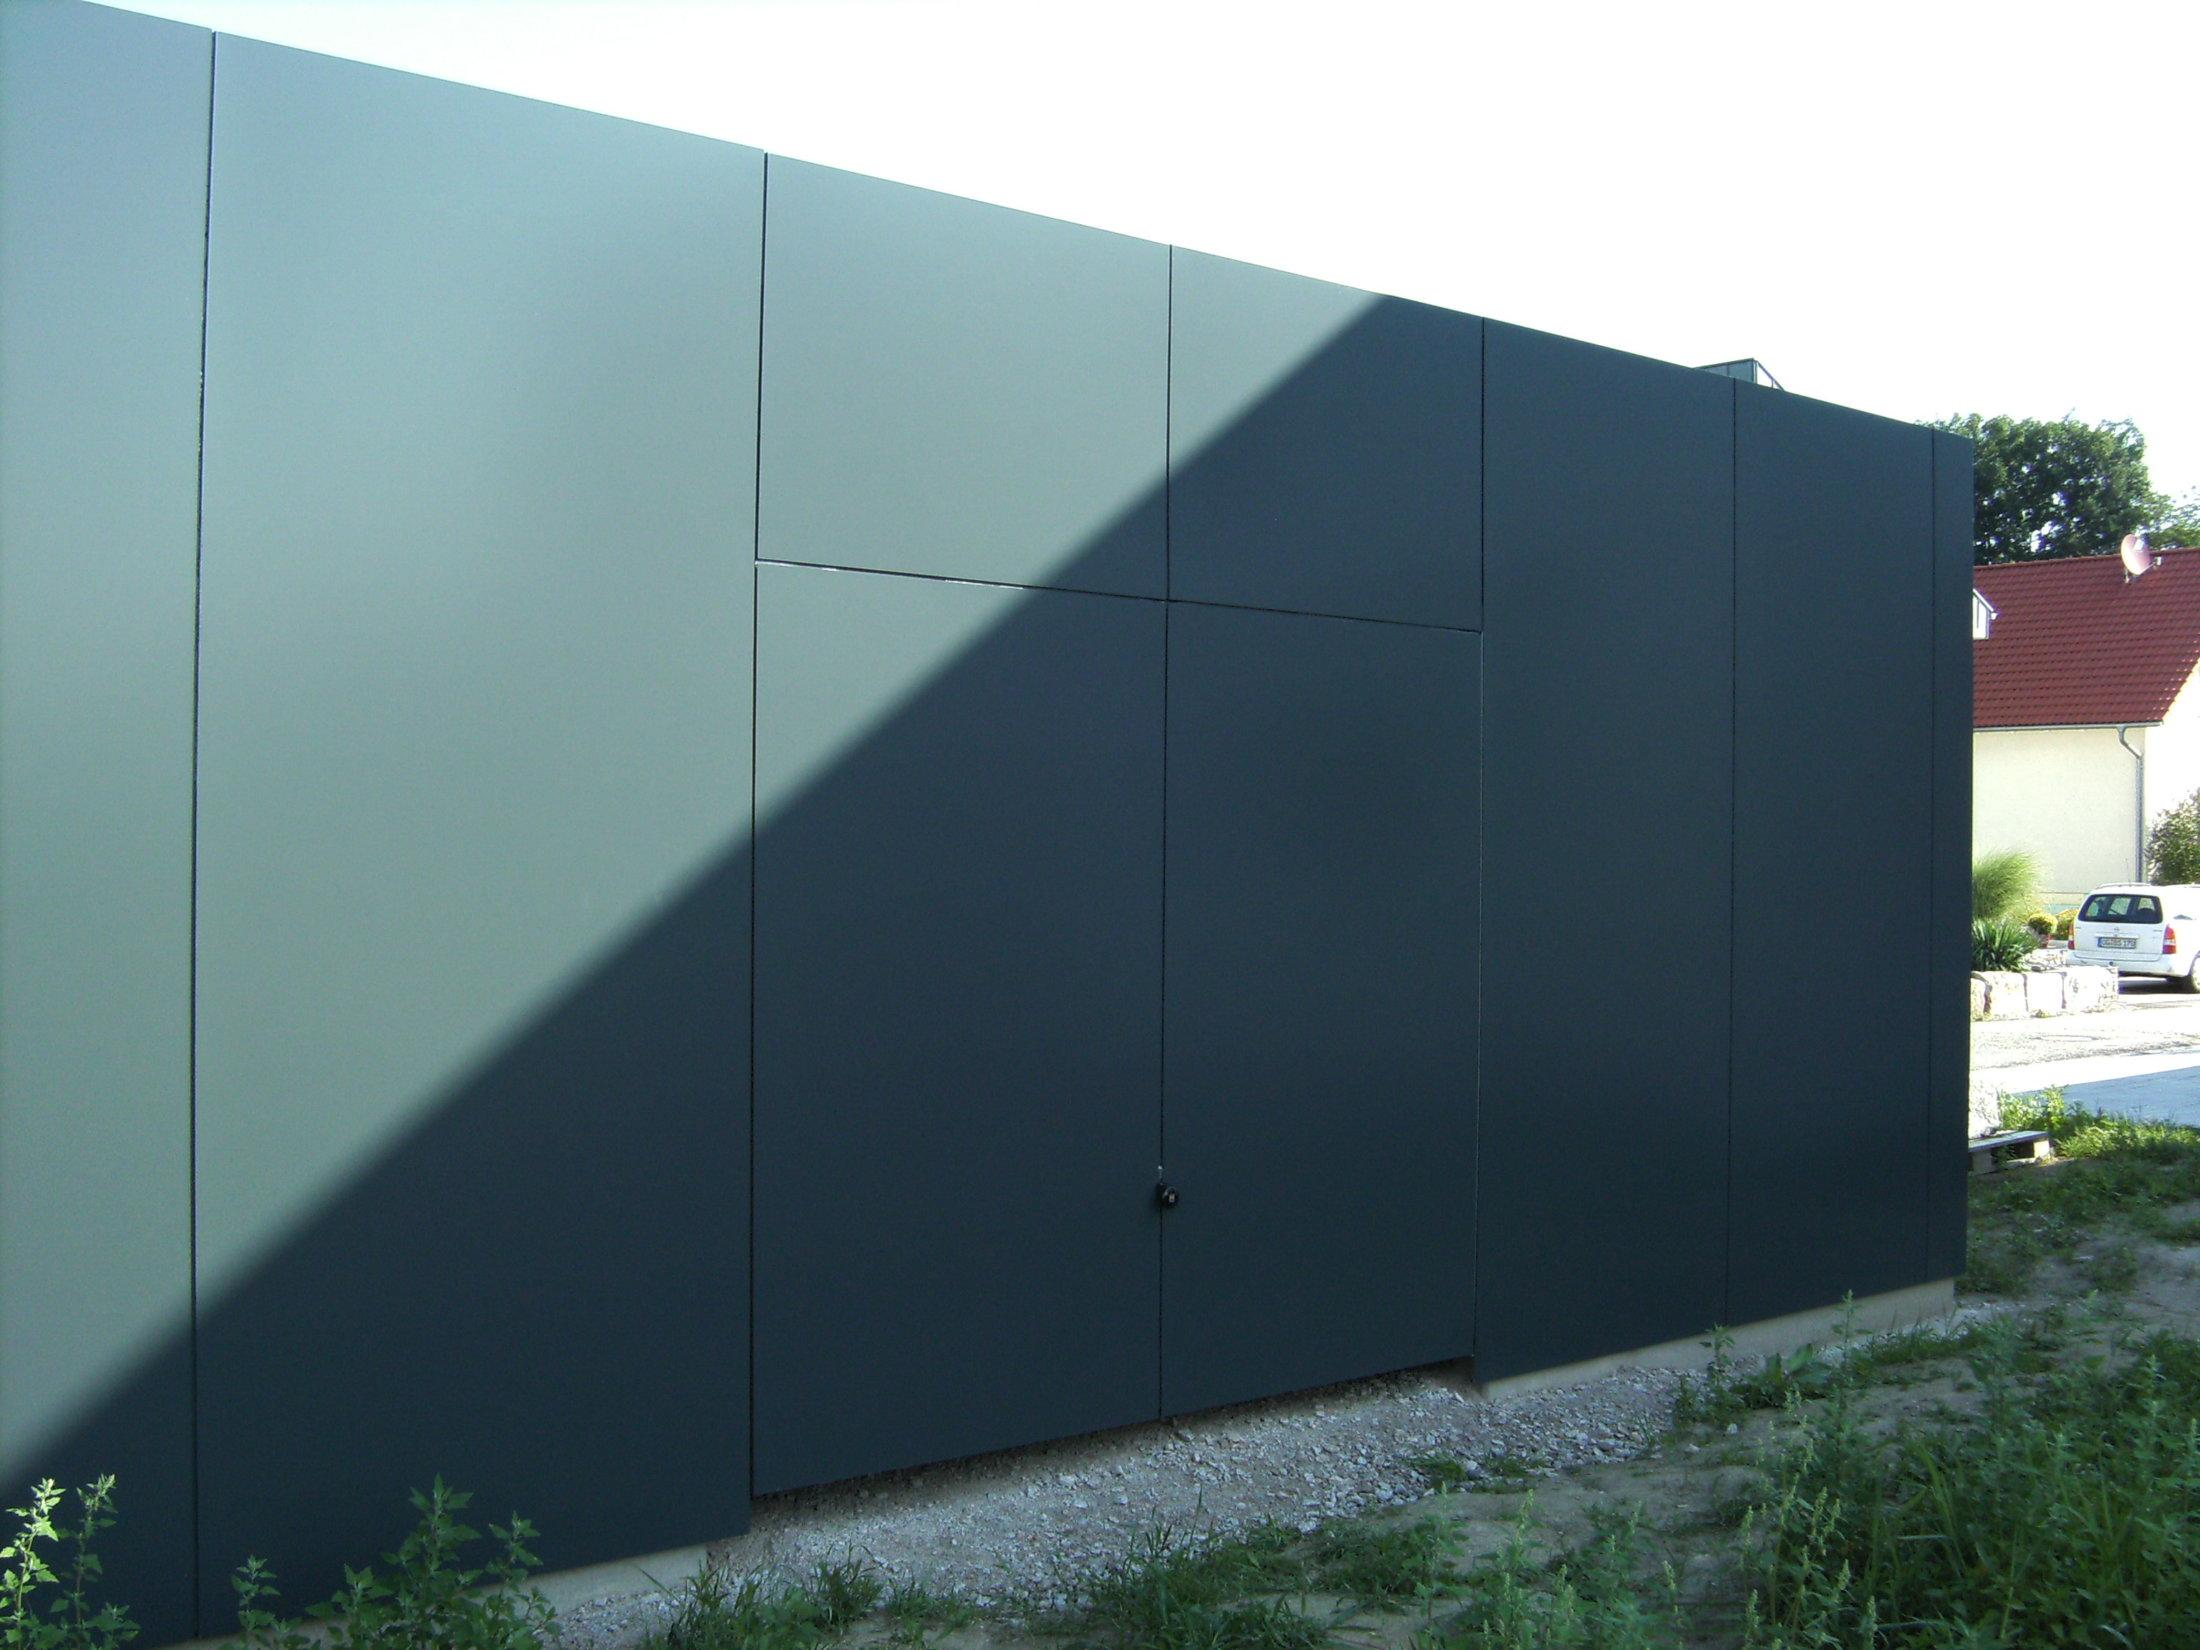 Flächenbündiges Schwingtor mit Fassadenplatten verkleidet